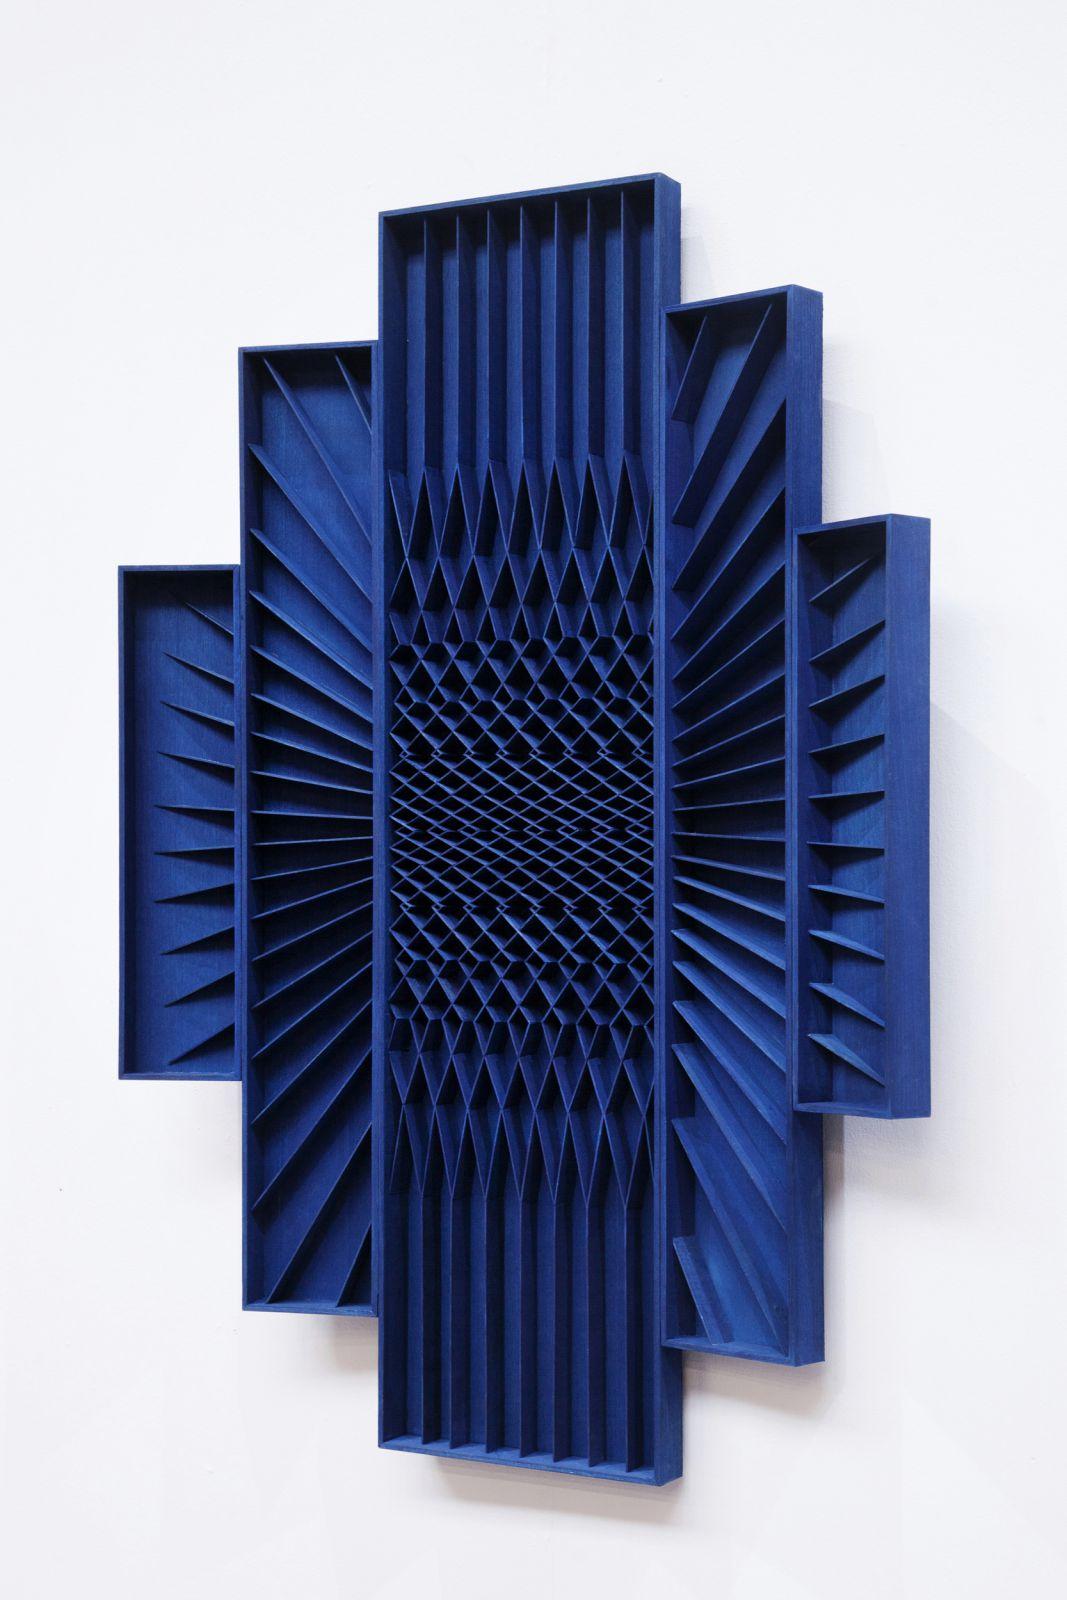 100 x 70cm, wood, cobalt ink, 2017